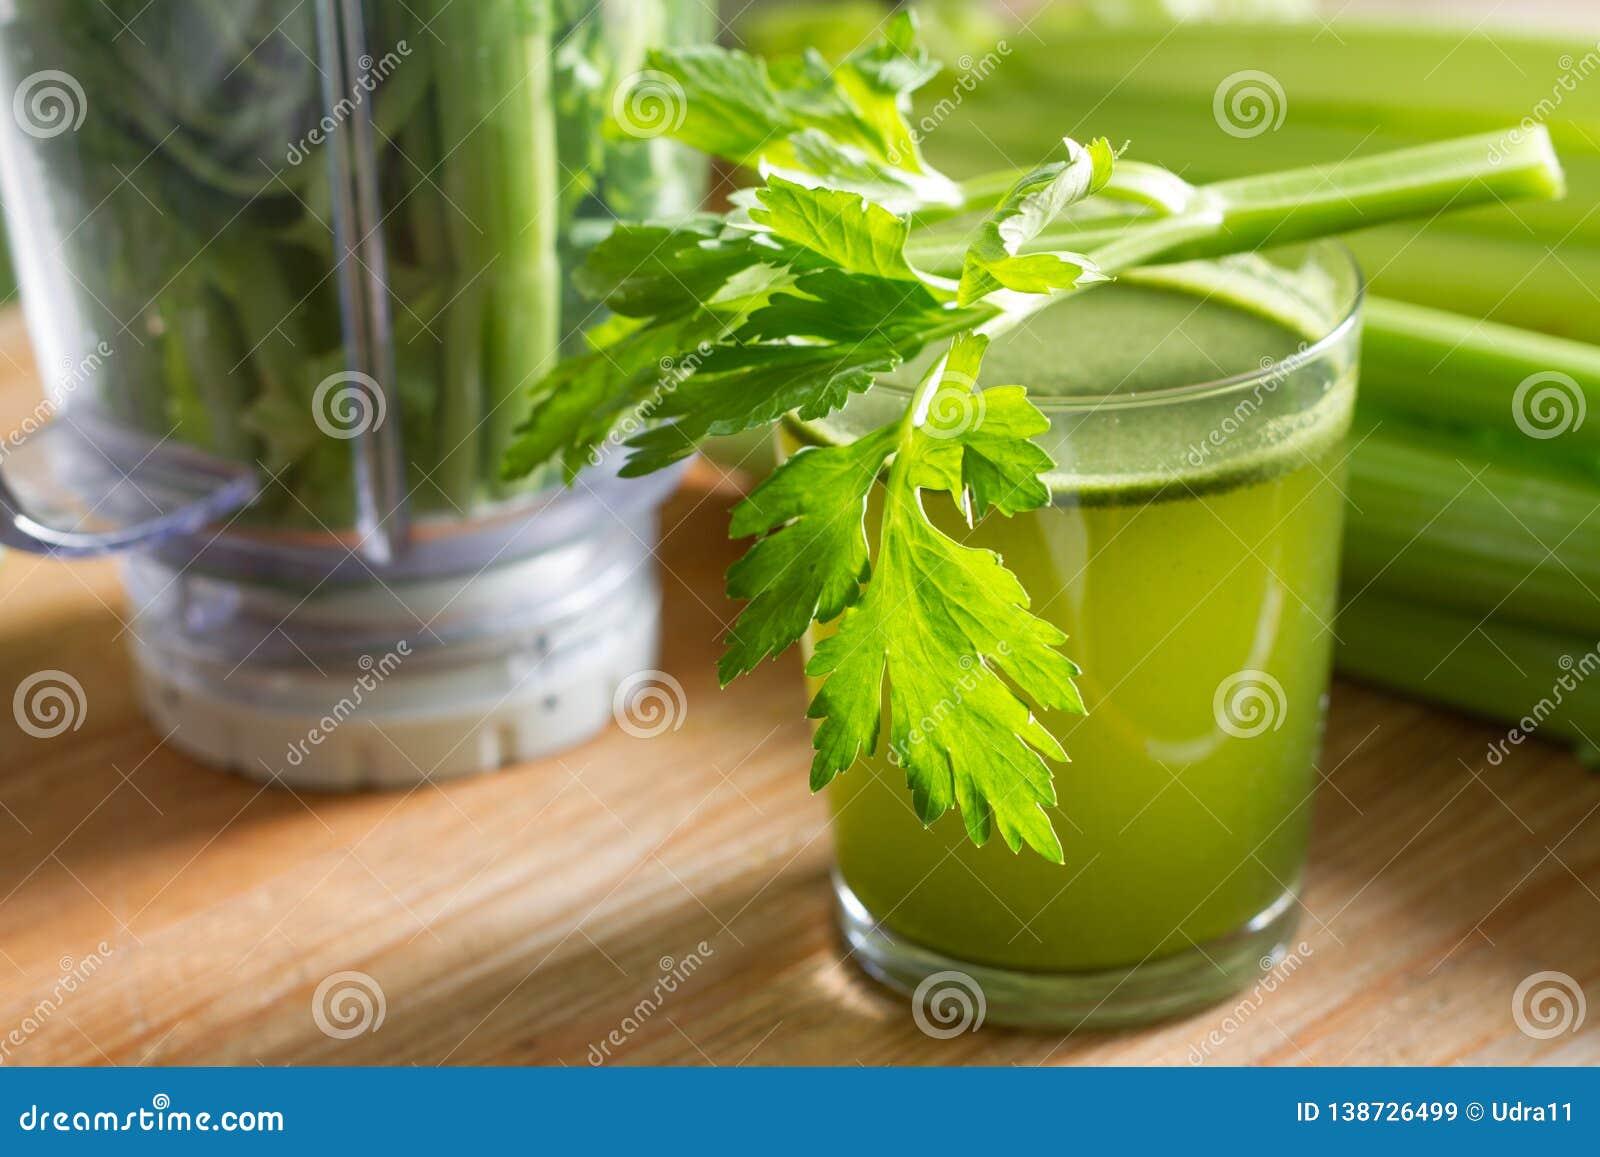 Celery juice healthy life stile and blender on wooden board